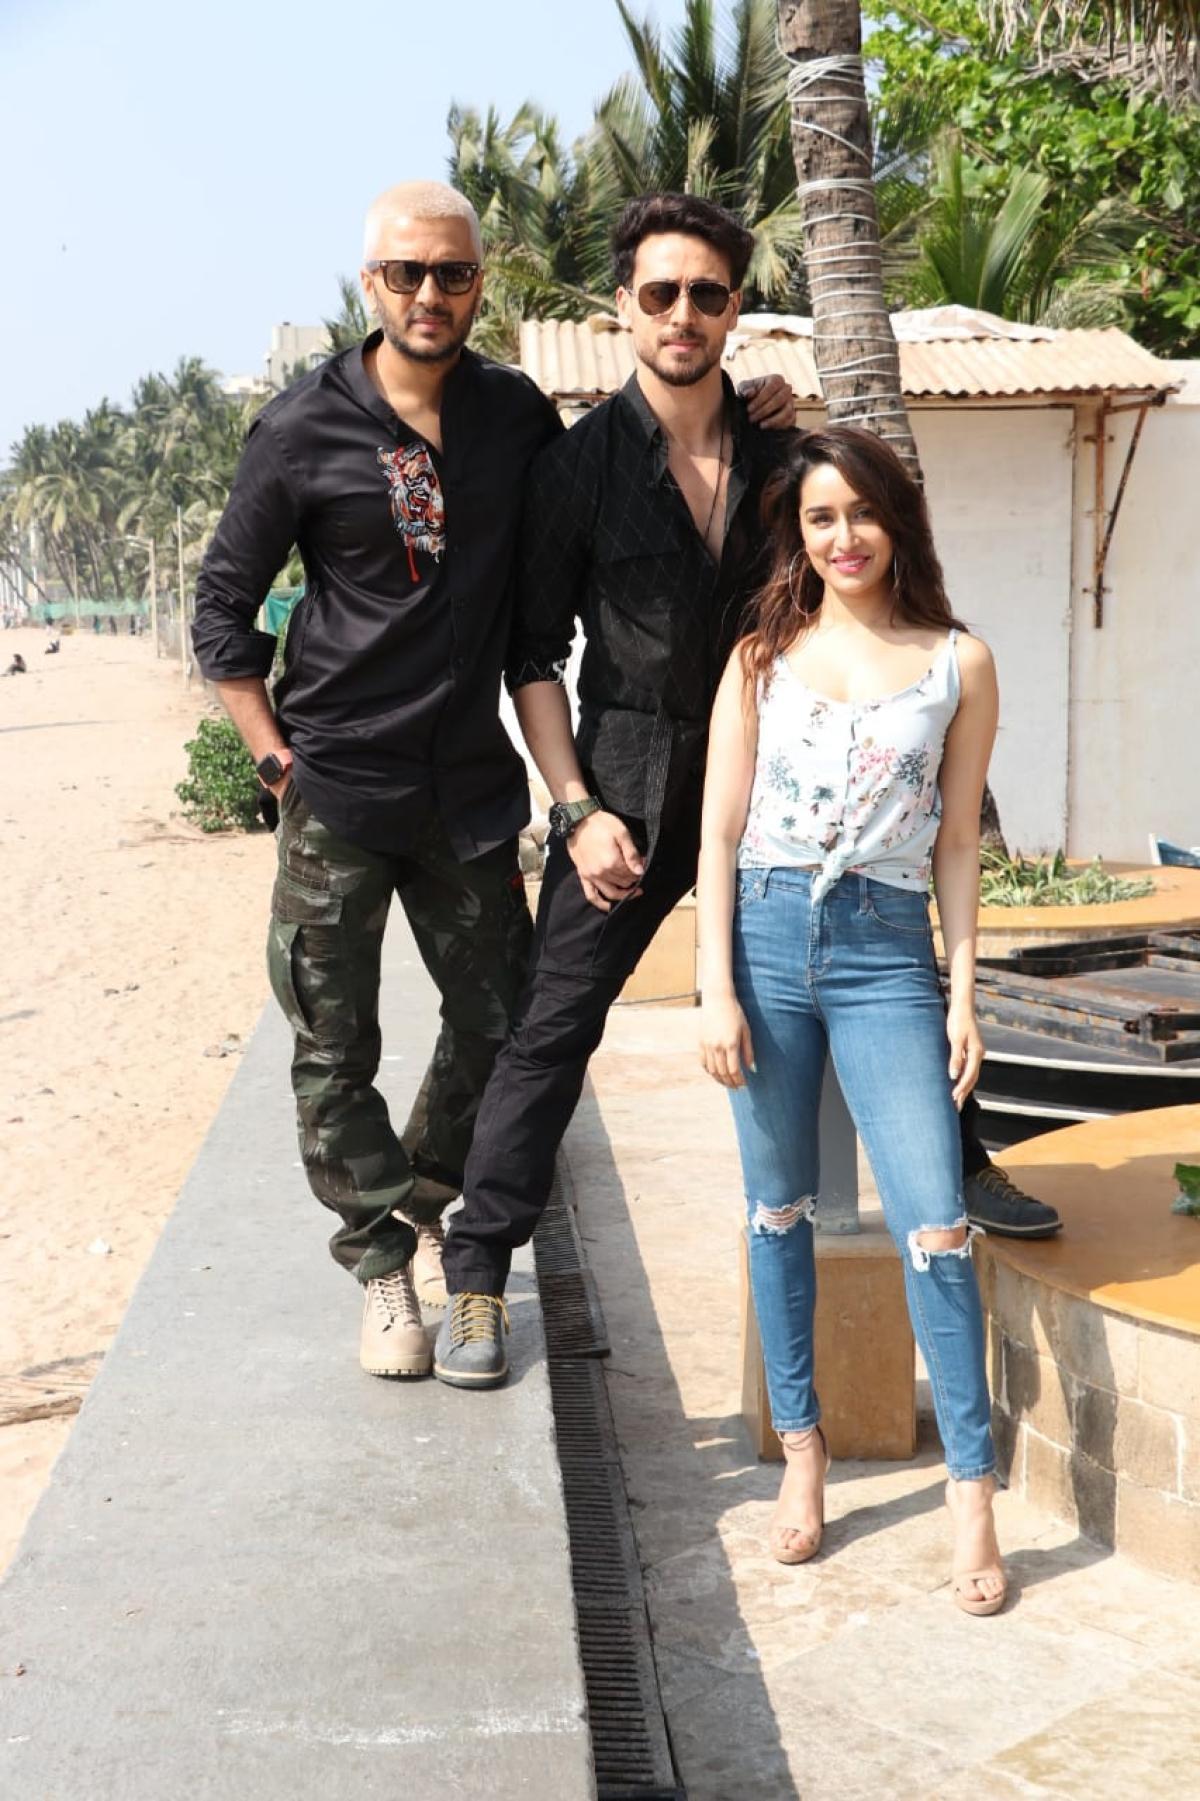 Baaghi 3' starcast - Tiger Shroff, Shraddha Kapoor and Riteish Deshmukh